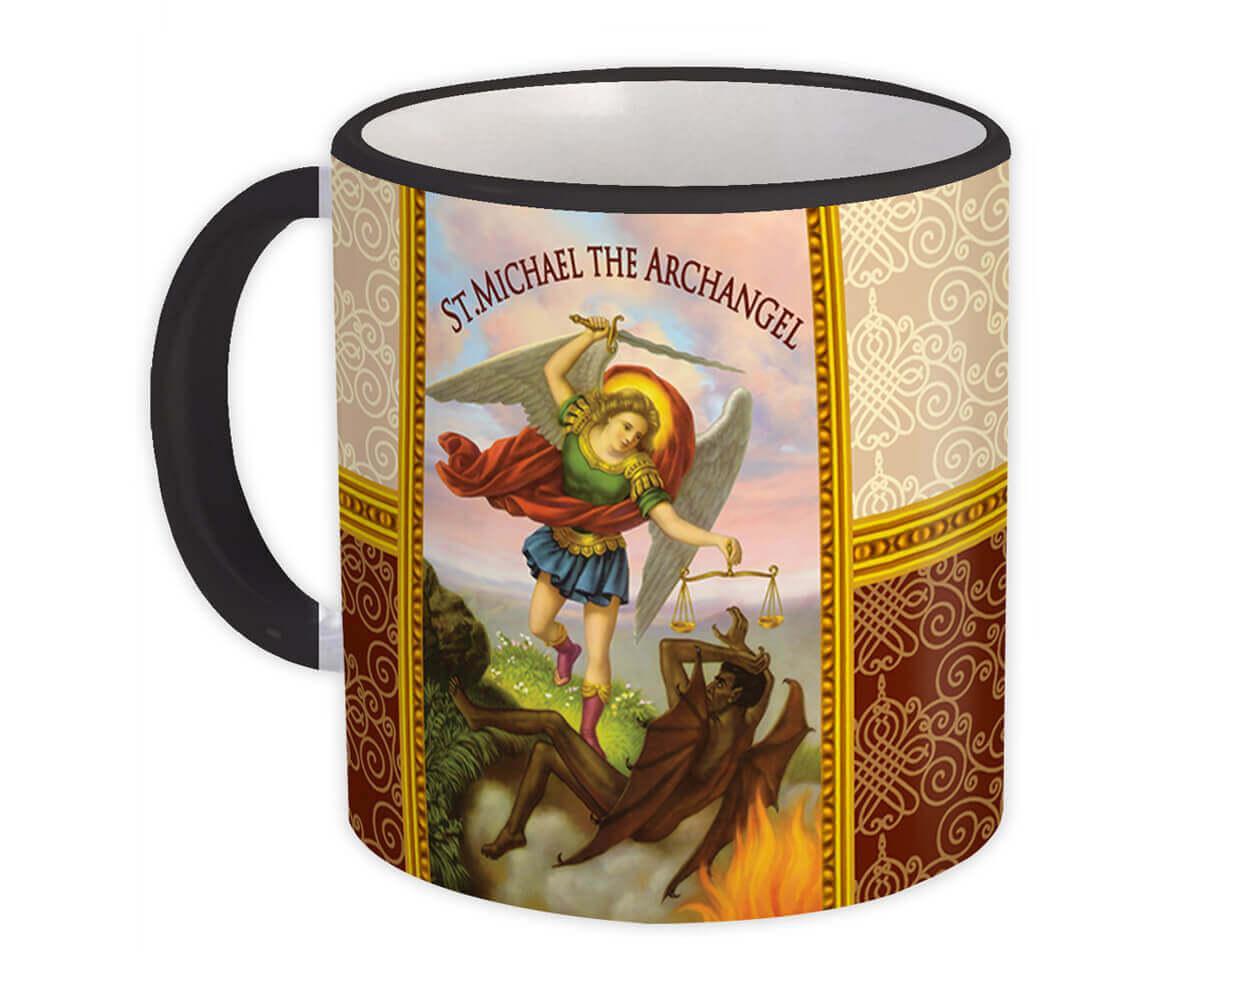 St Michael The Archangel : Gift Mug Angel Catholic Religious Saint